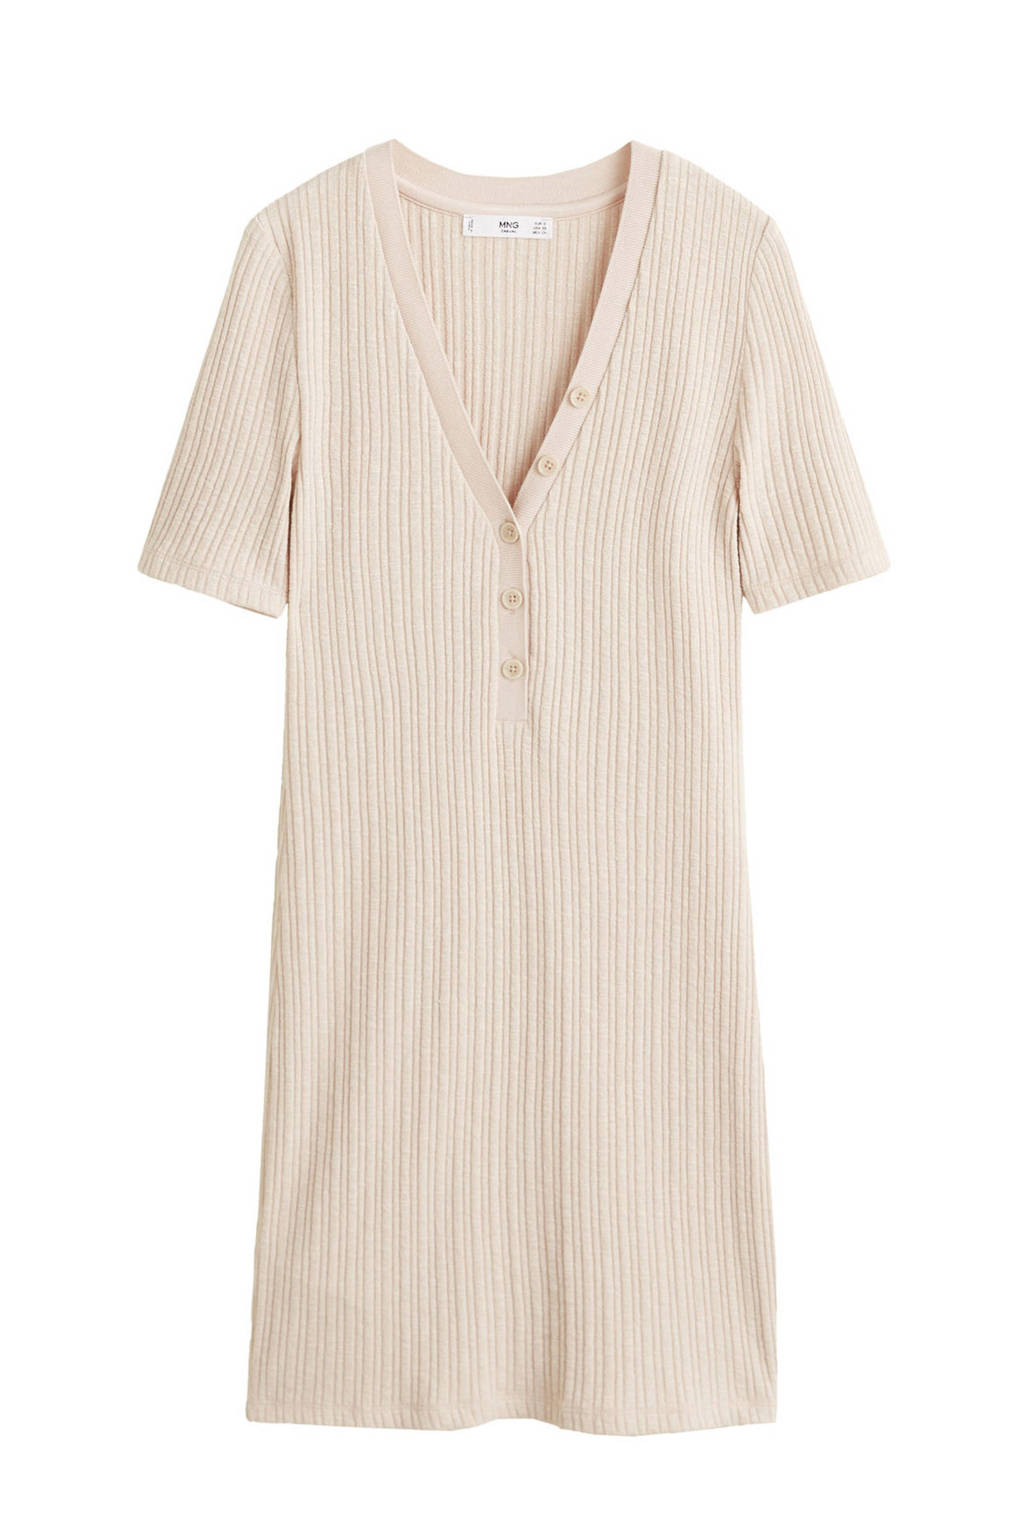 3c40fbe59e57aa Mango geribde getailleerde jurk beige